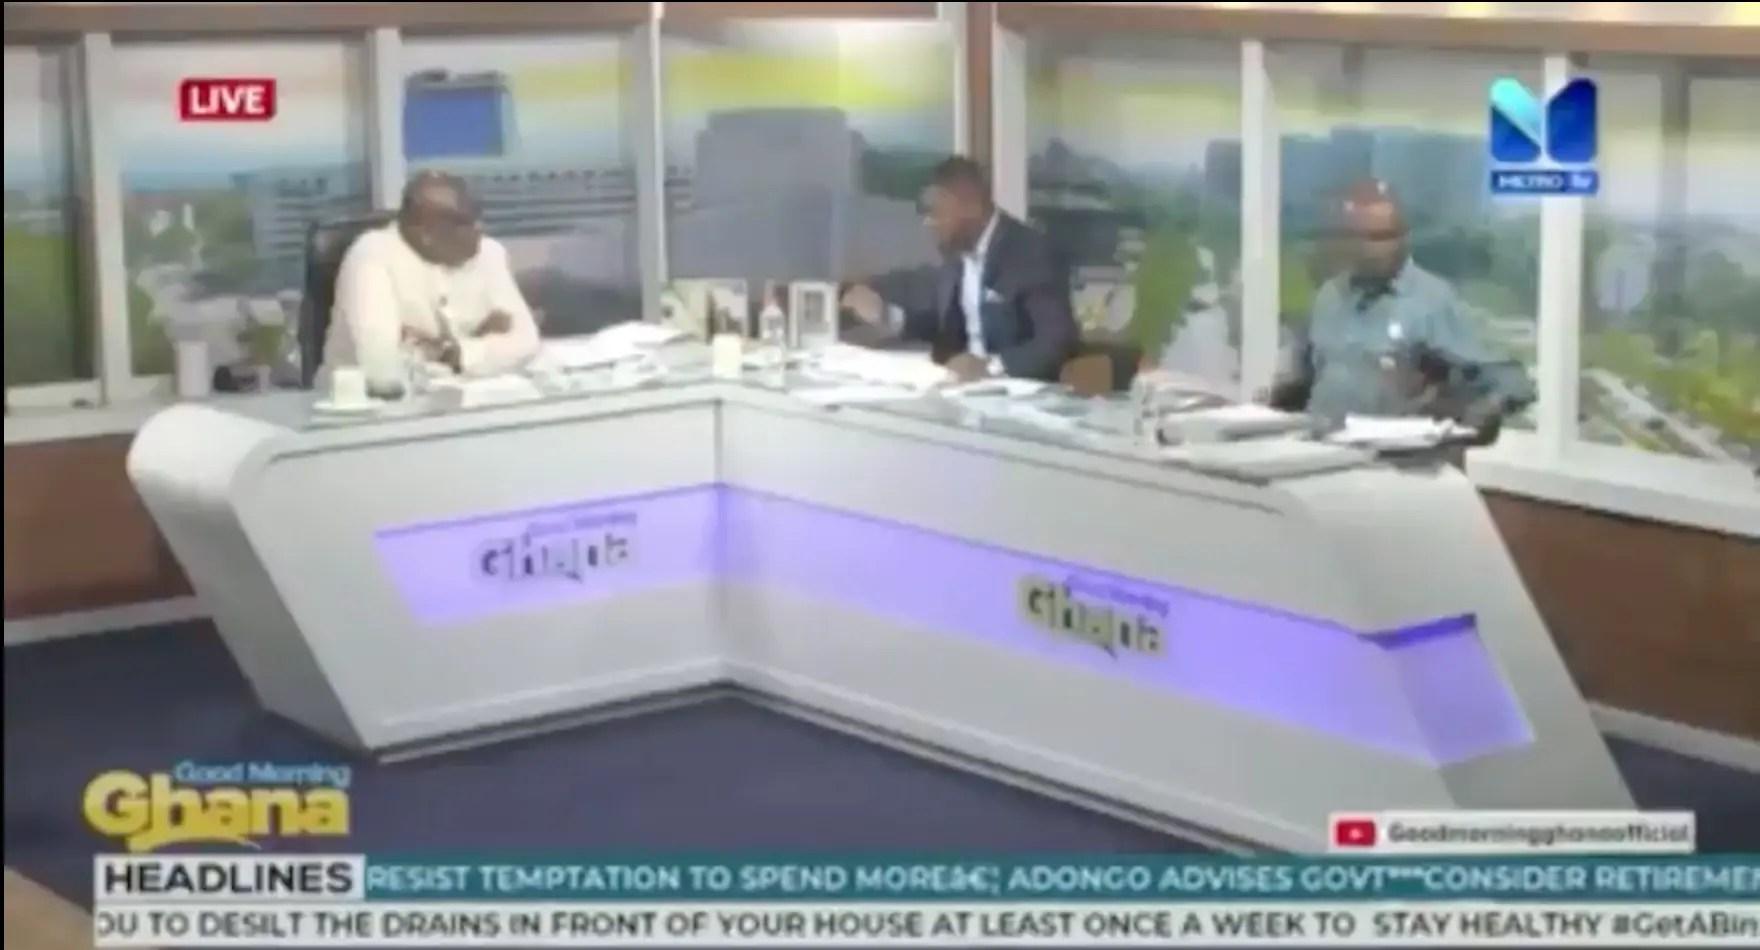 Sammy Gyamfi receives social media praise for annihilating Kweku Baako on Metro TV over $170 million judgment debt